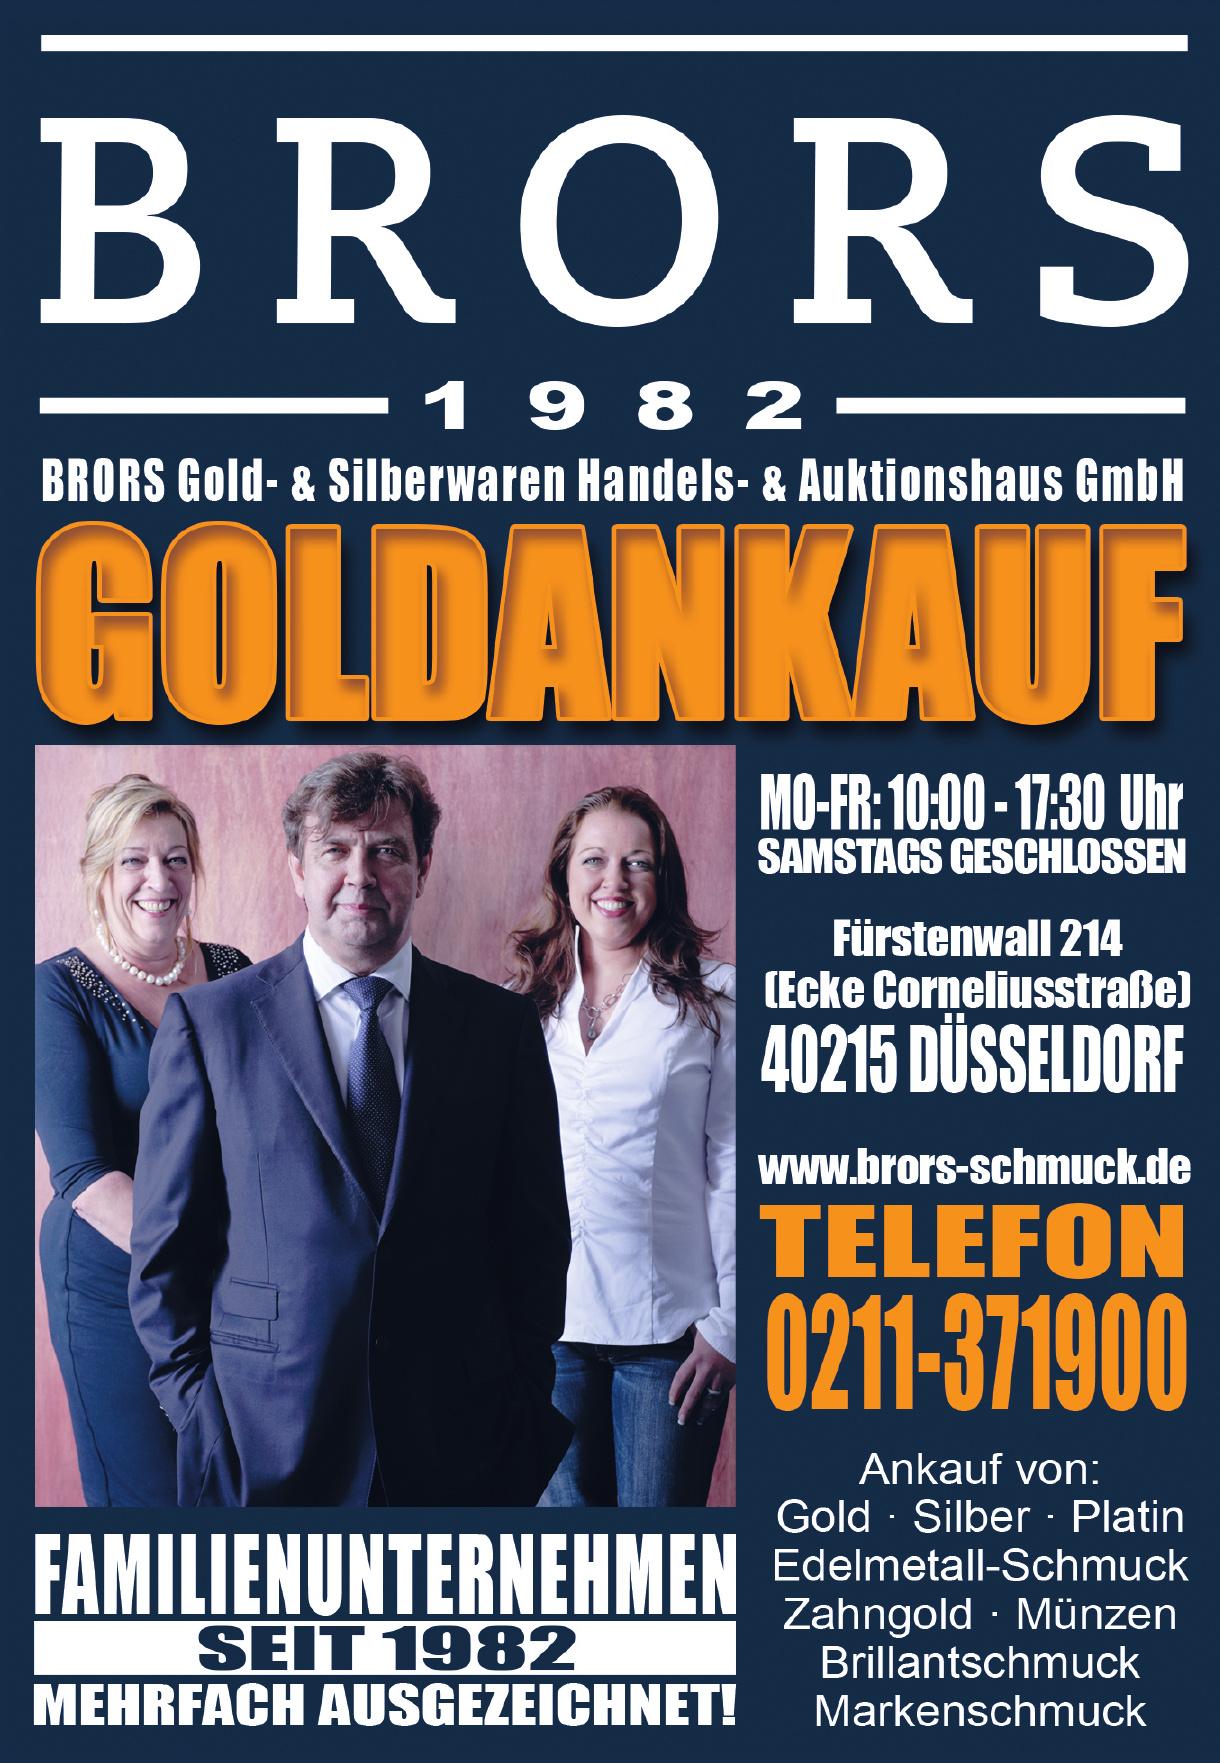 Brors Gold- & Silberwaren Handels- & Auktionshaus GmbH